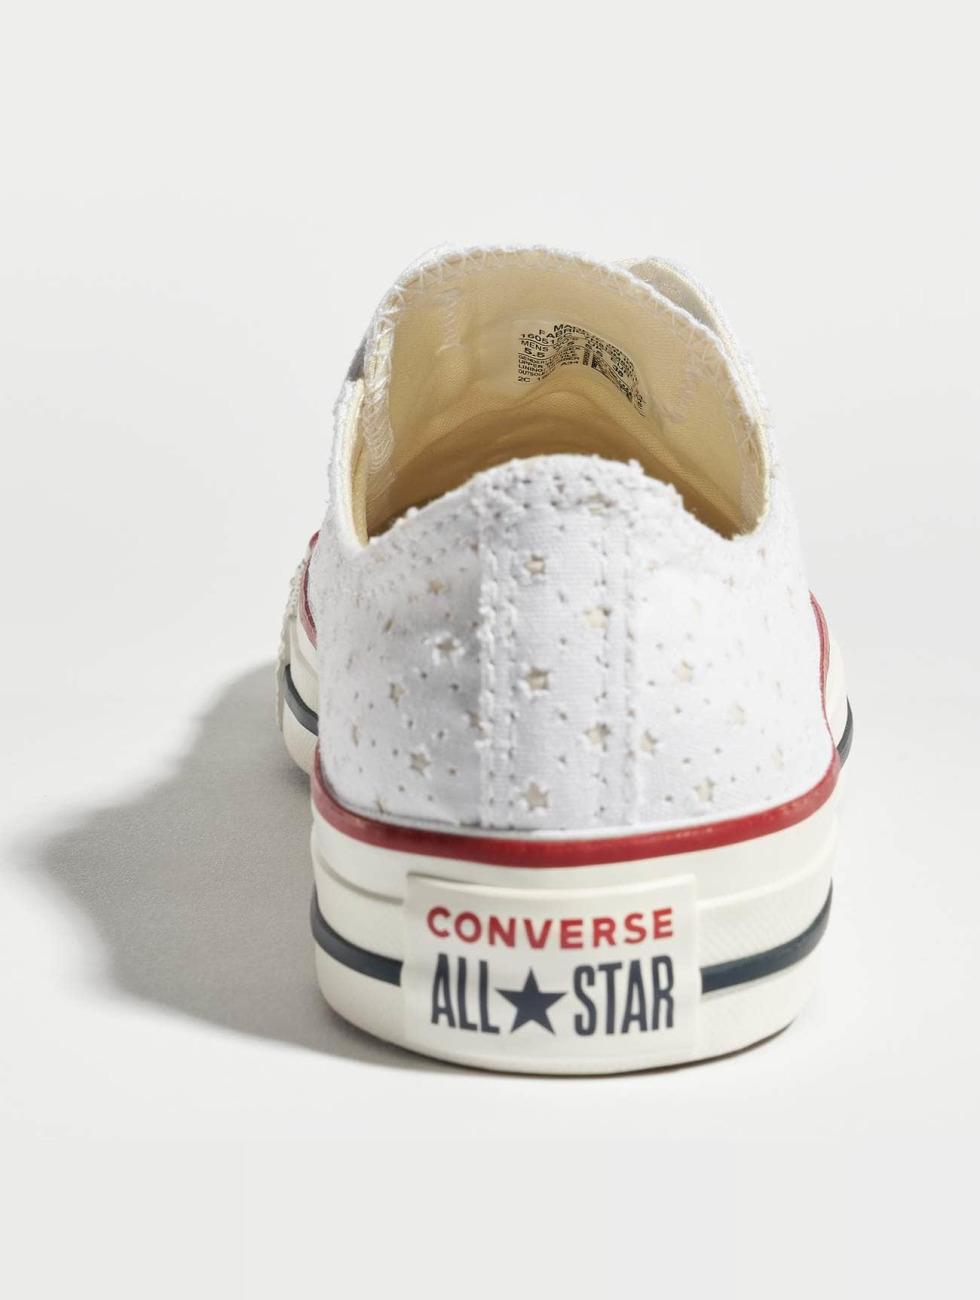 Converse Pattino / Sneaker Cta Bue In Bianco 441 877 gbDyG